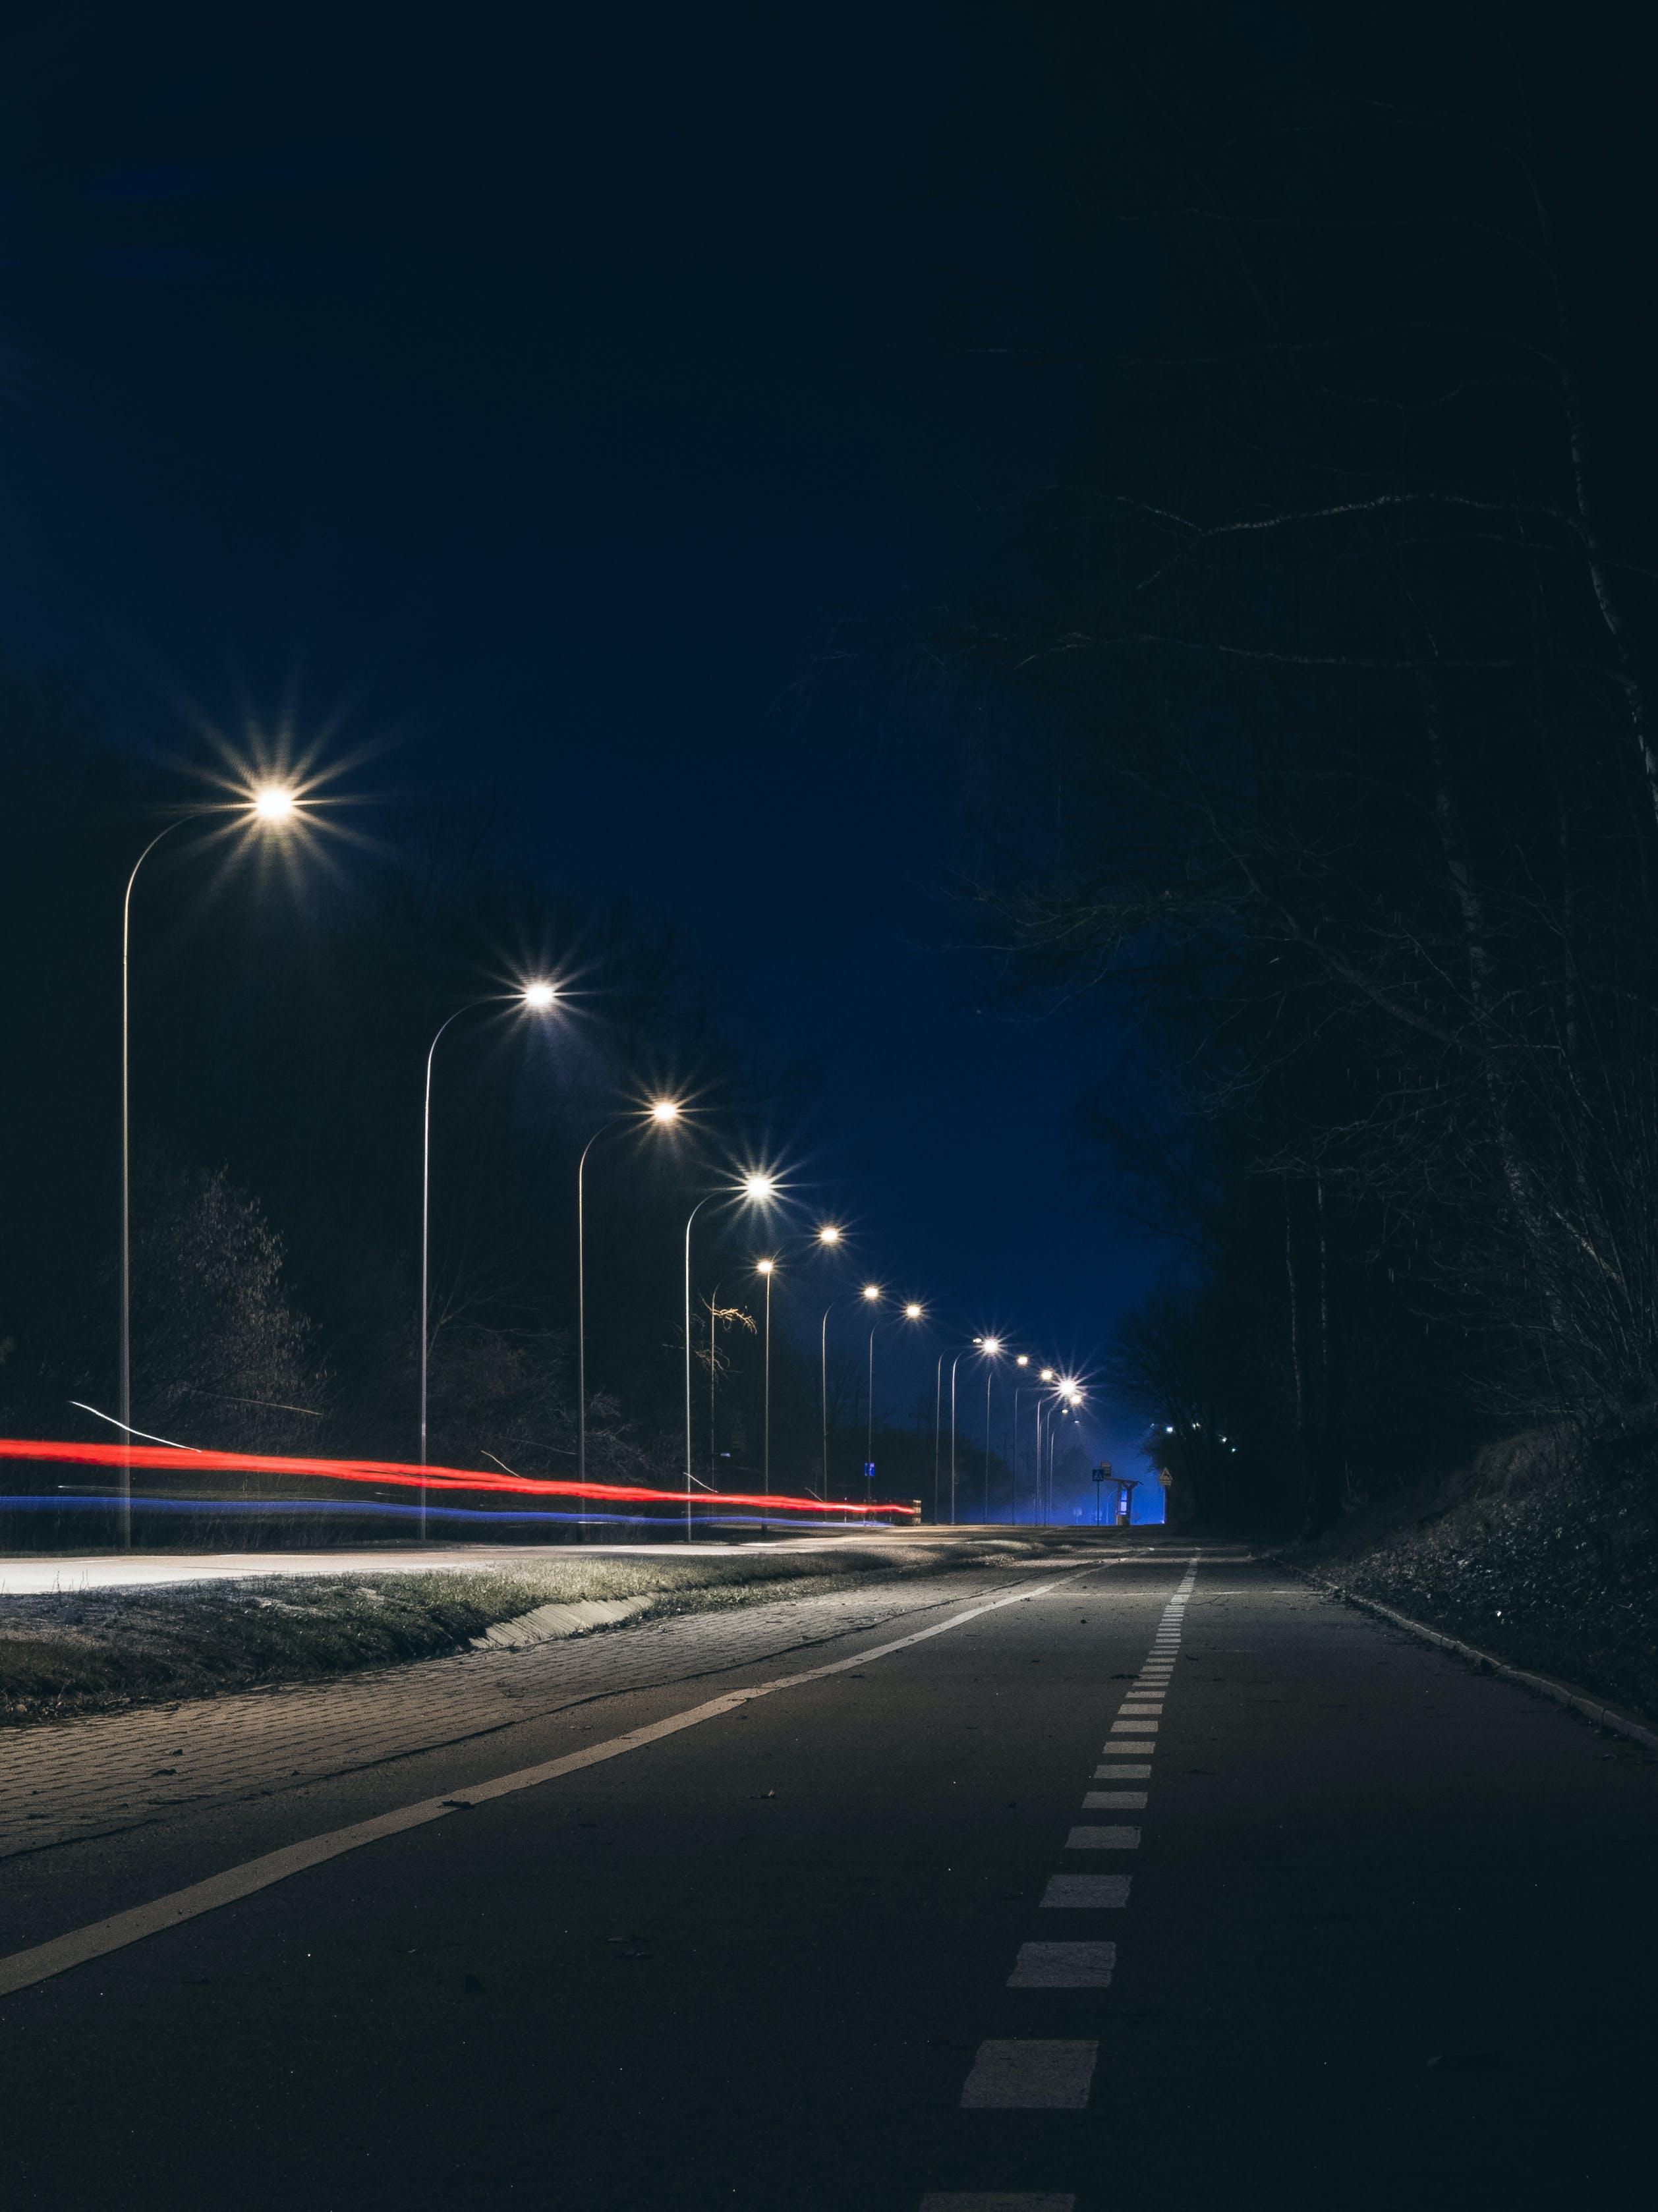 Free stock photo of road, lights, night, street